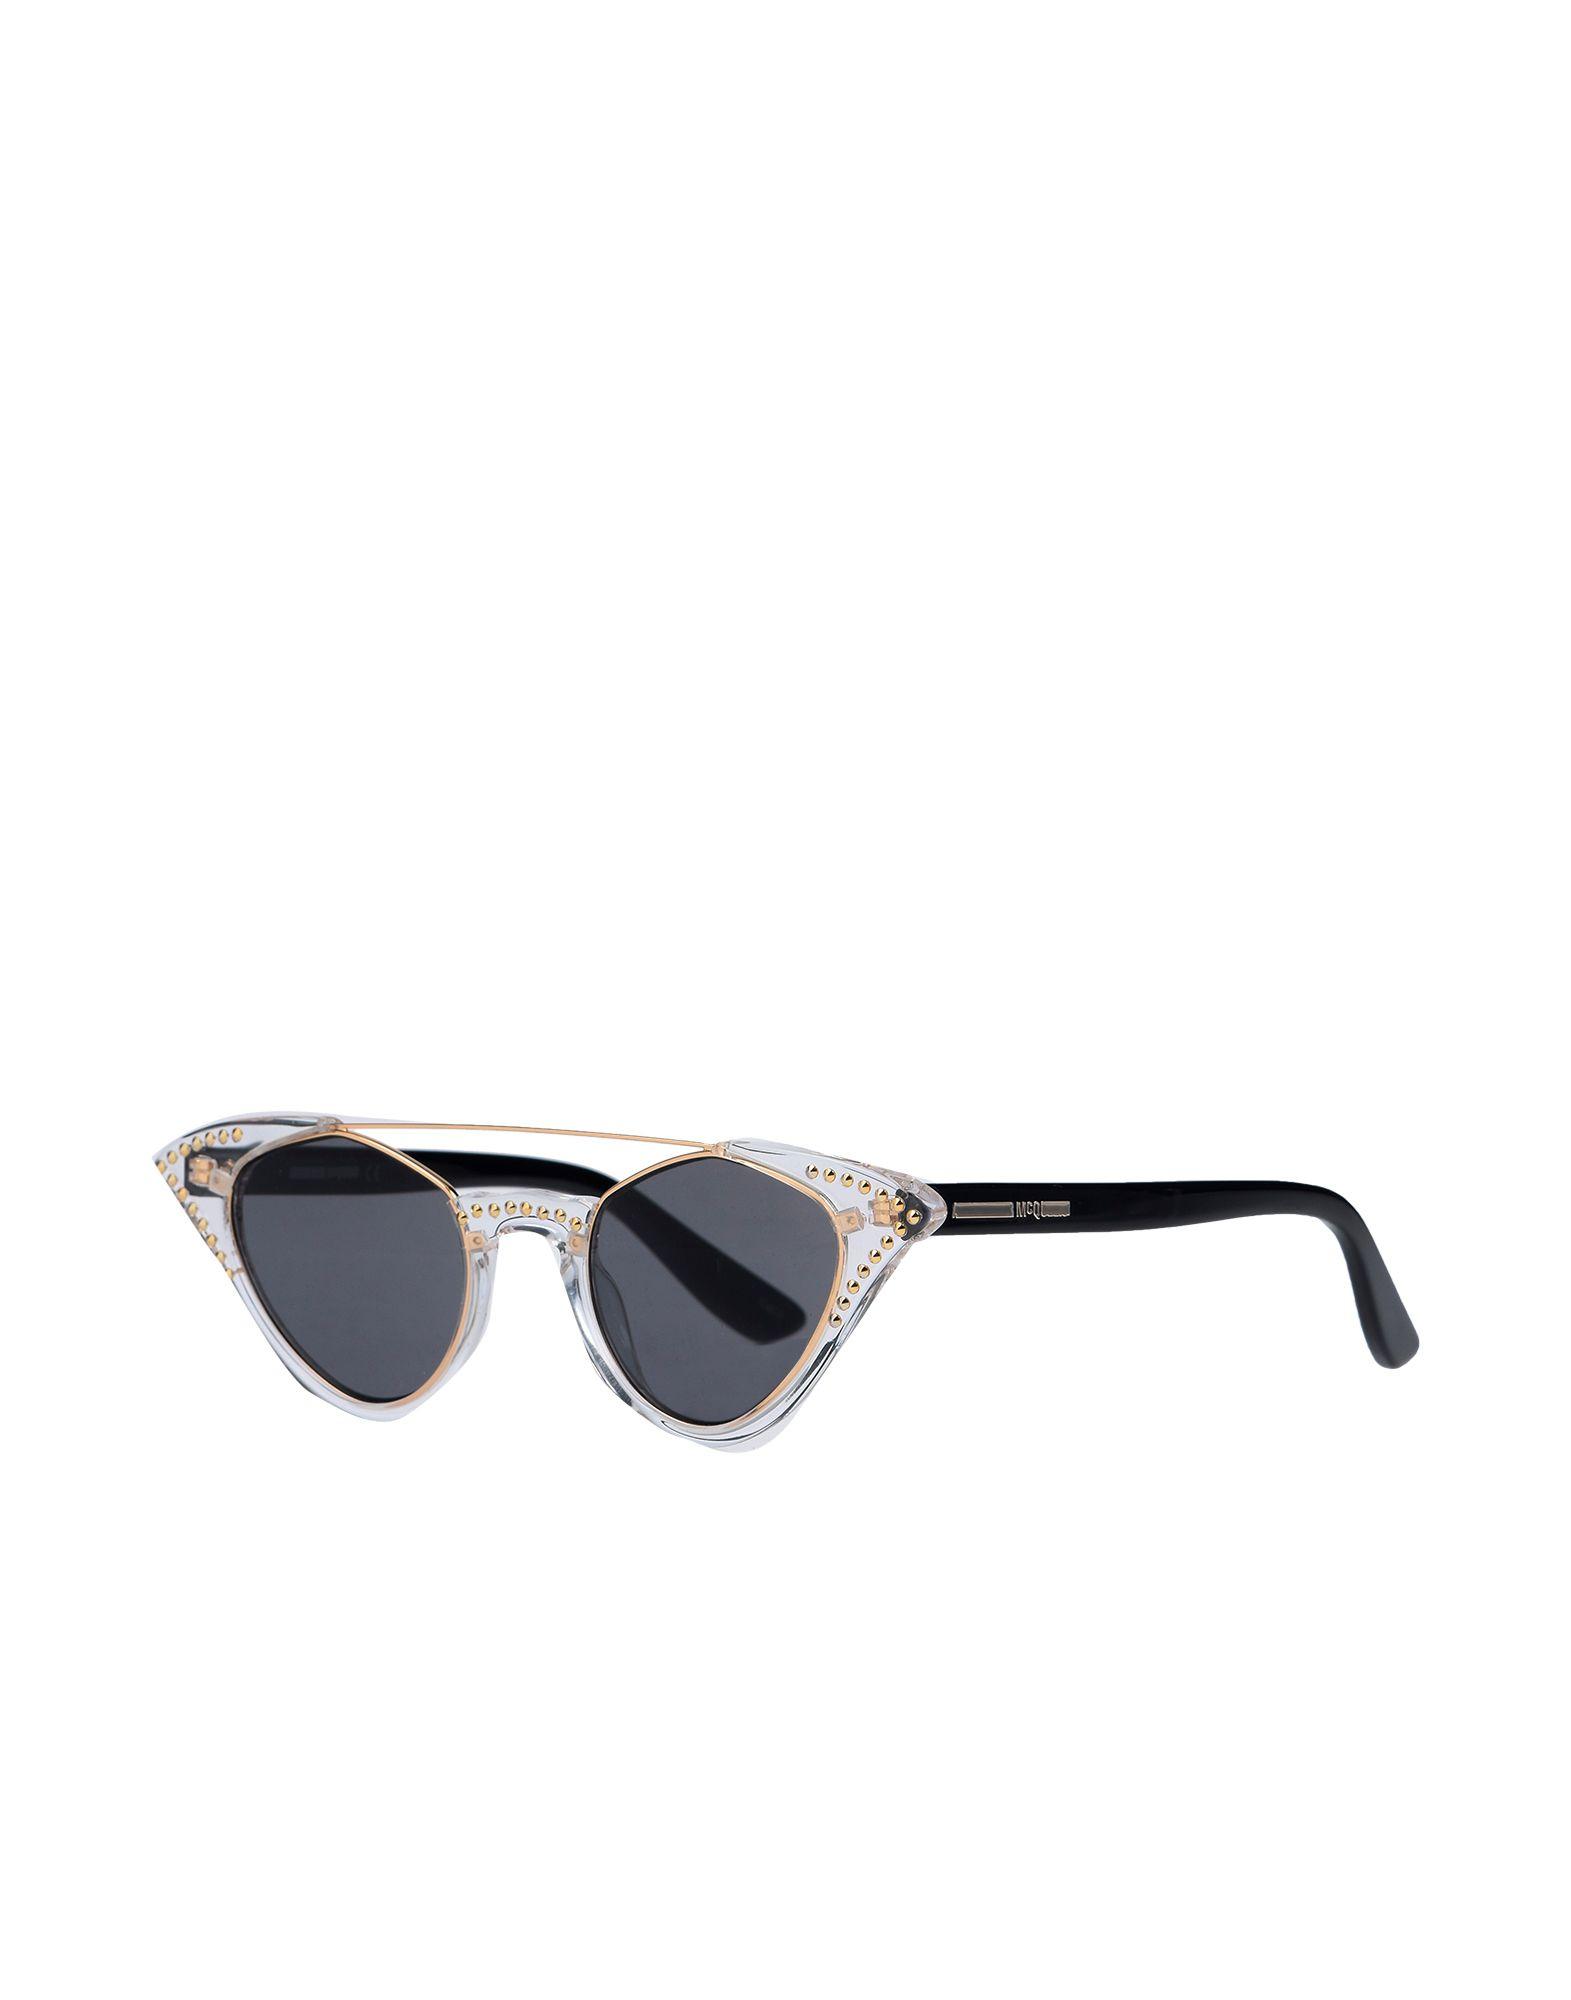 McQ Alexander McQueen Солнечные очки mcq alexander mcqueen солнечные очки